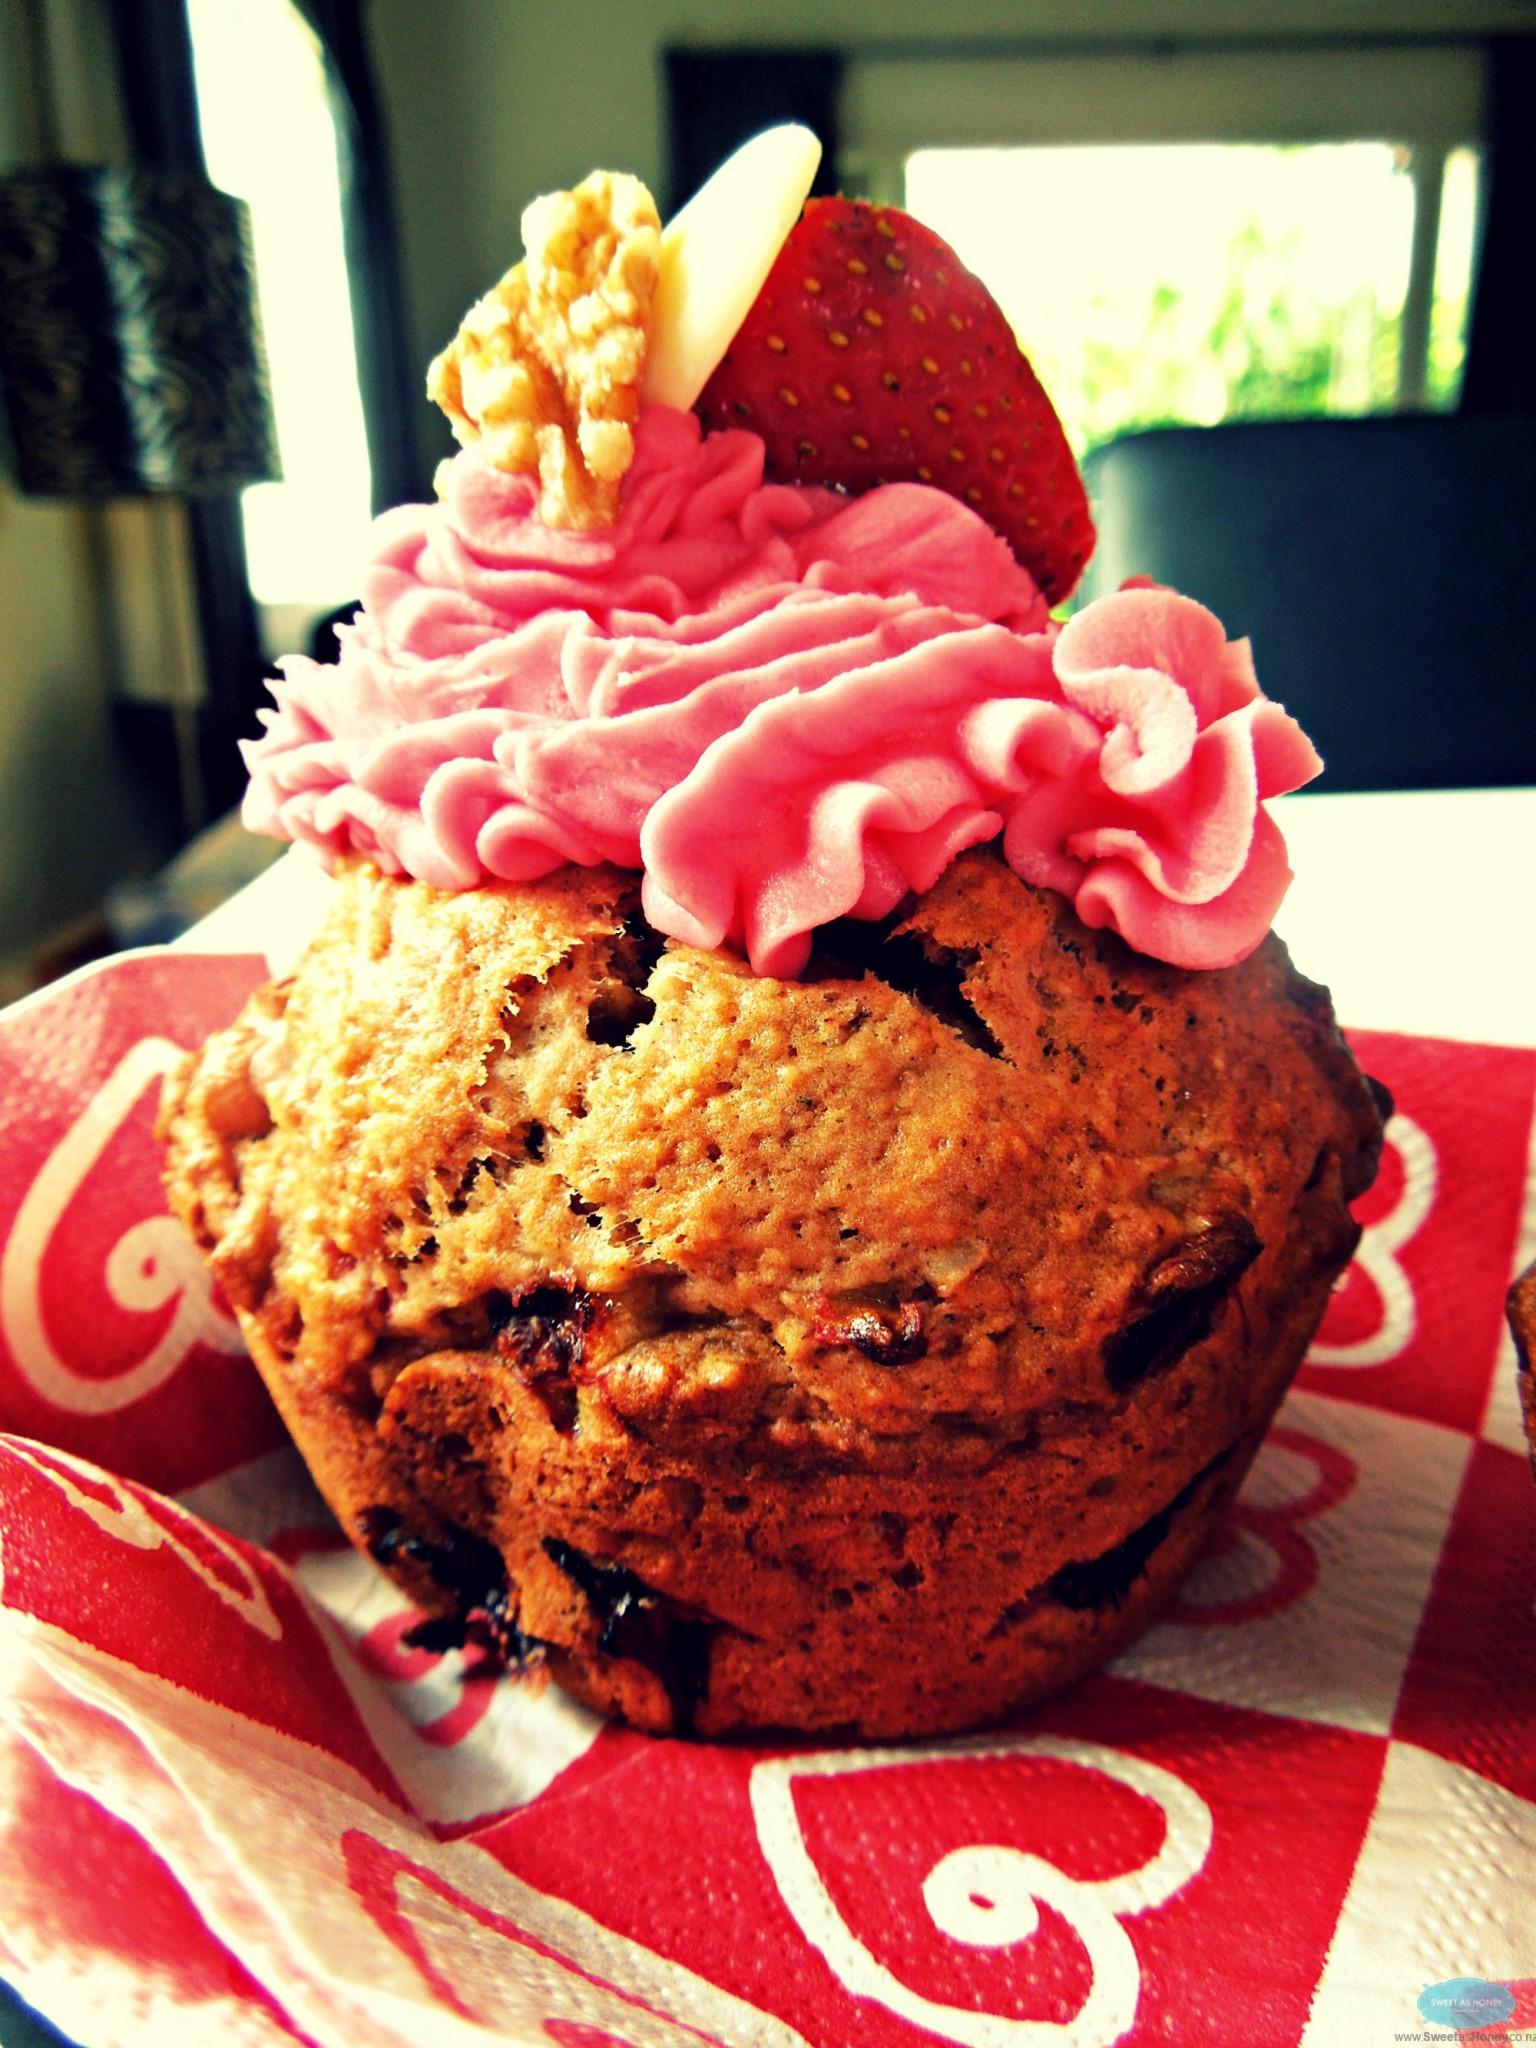 Strawberry White Chocolate Walnuts Muffins